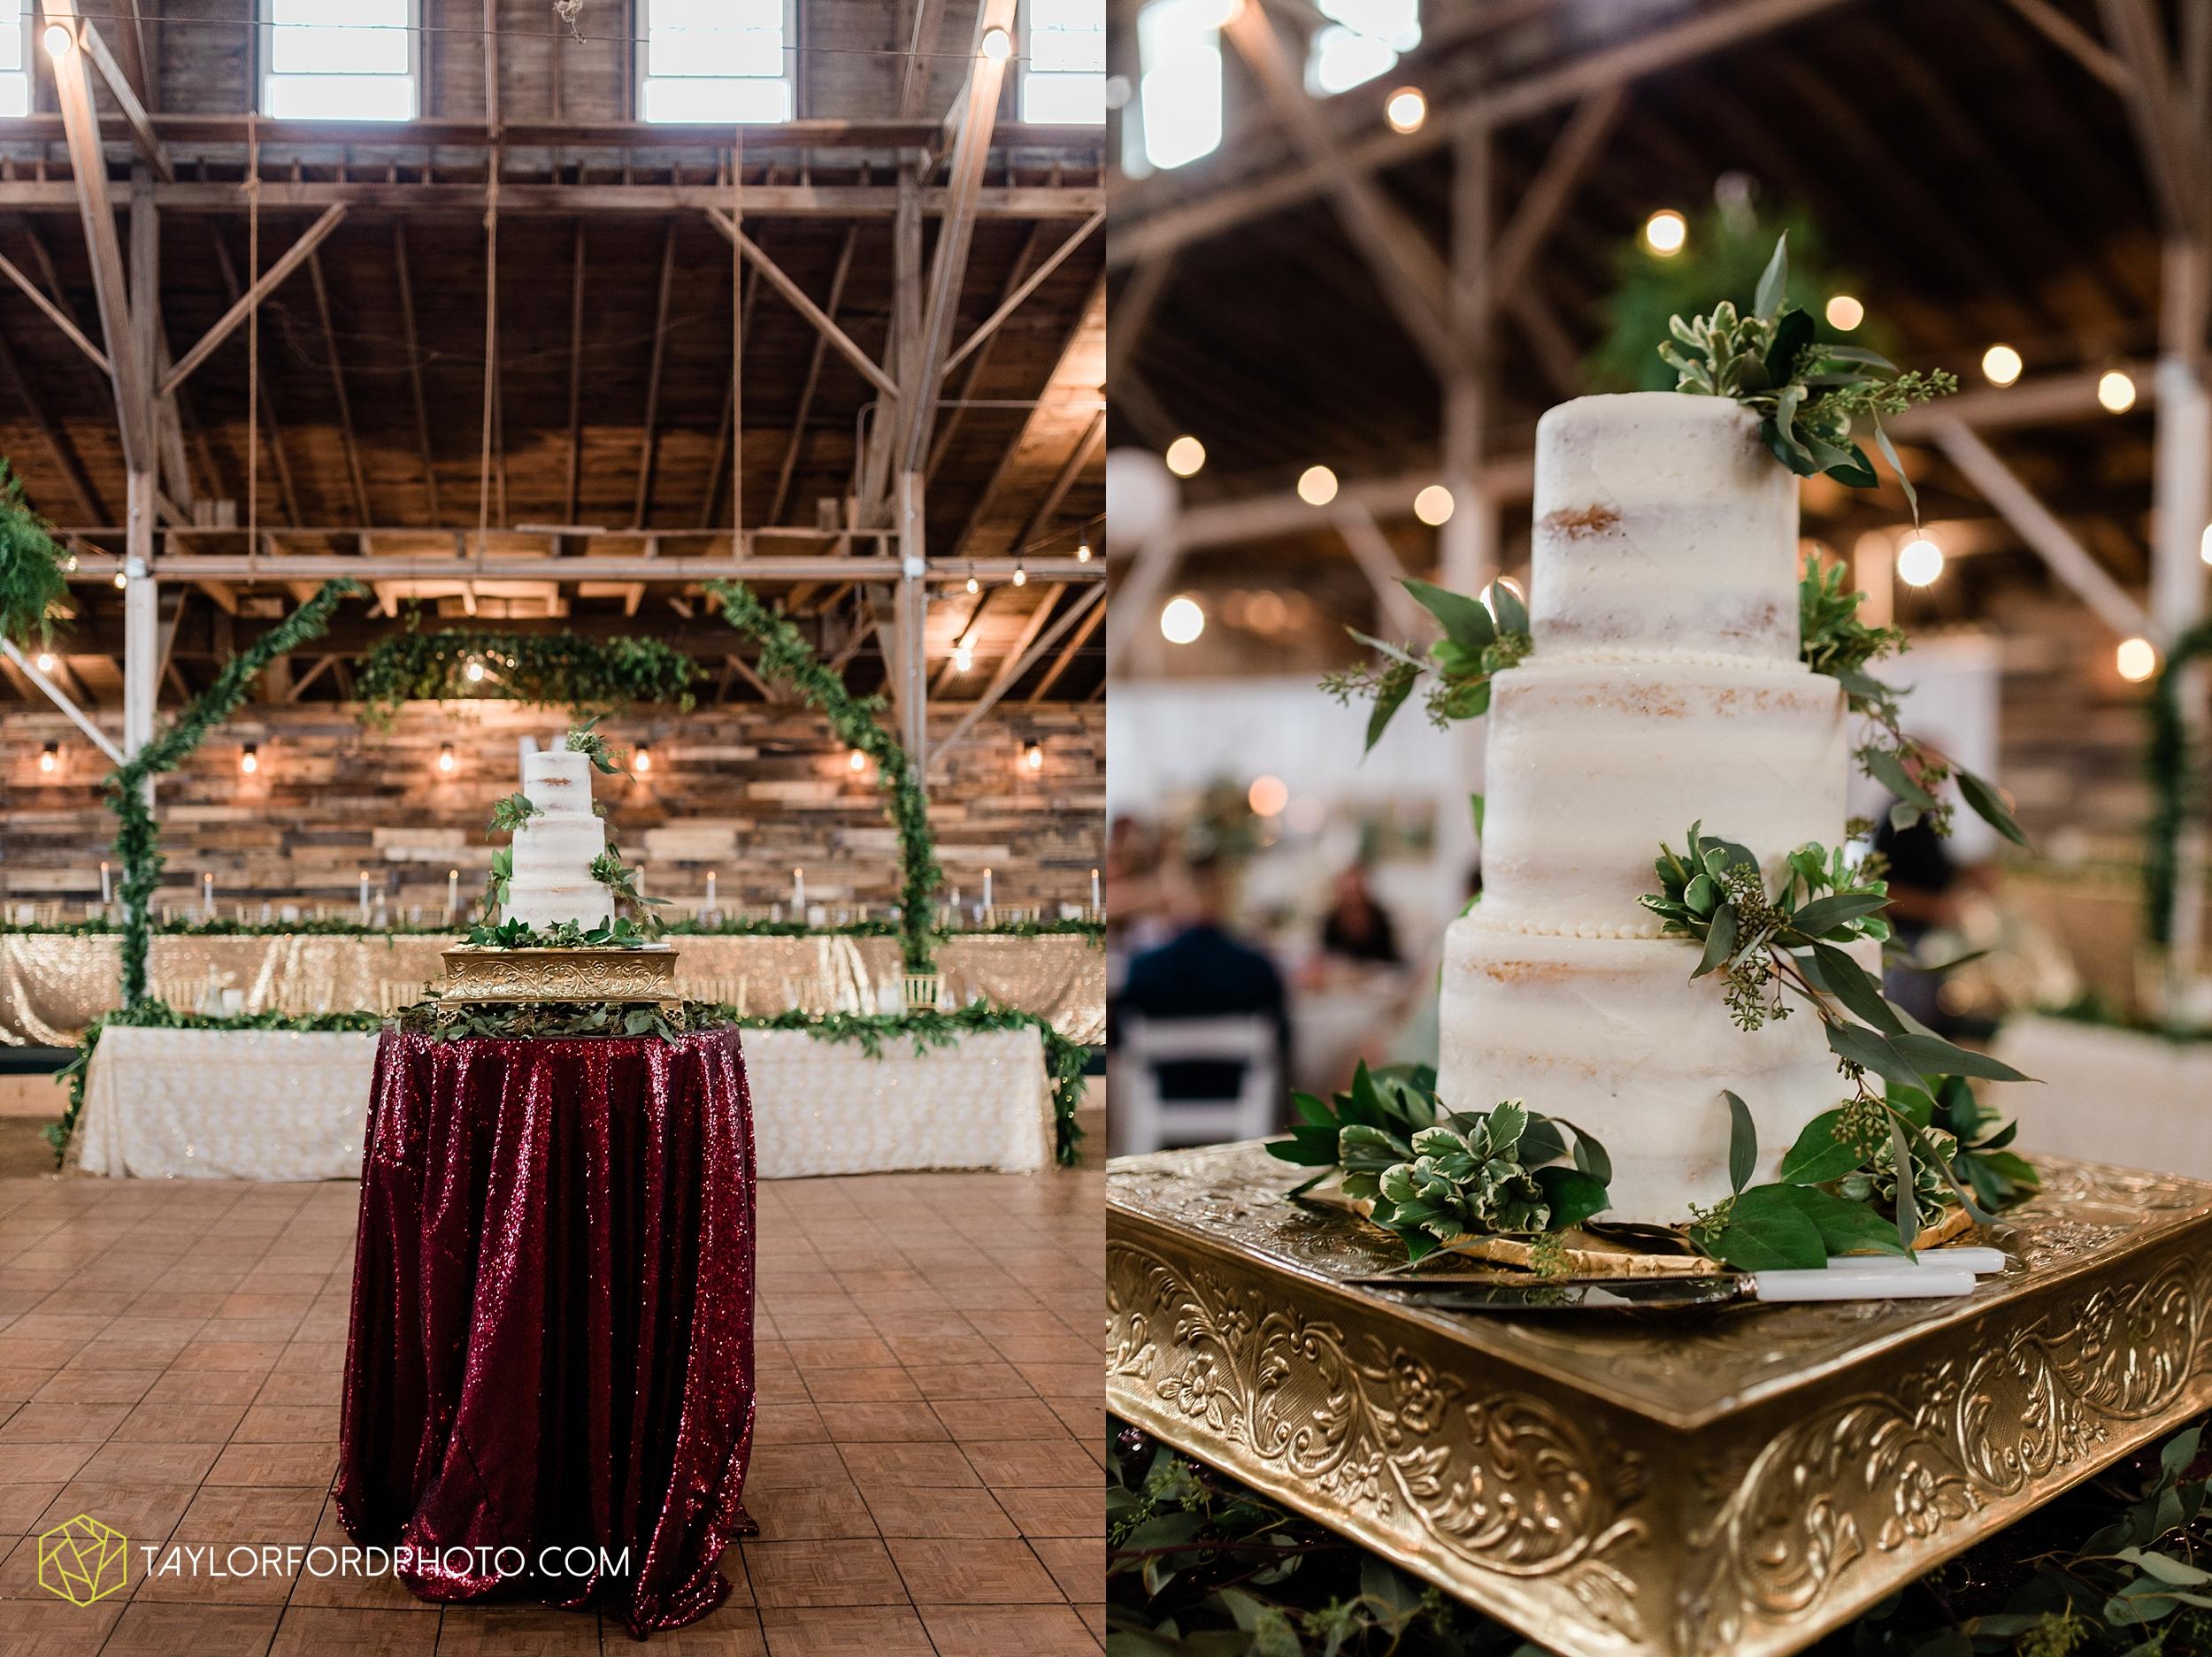 van-wert-ohio-first-united-methodist-church-county-dairy-barn-wedding-photographer-taylor-ford-photography_9864.jpg